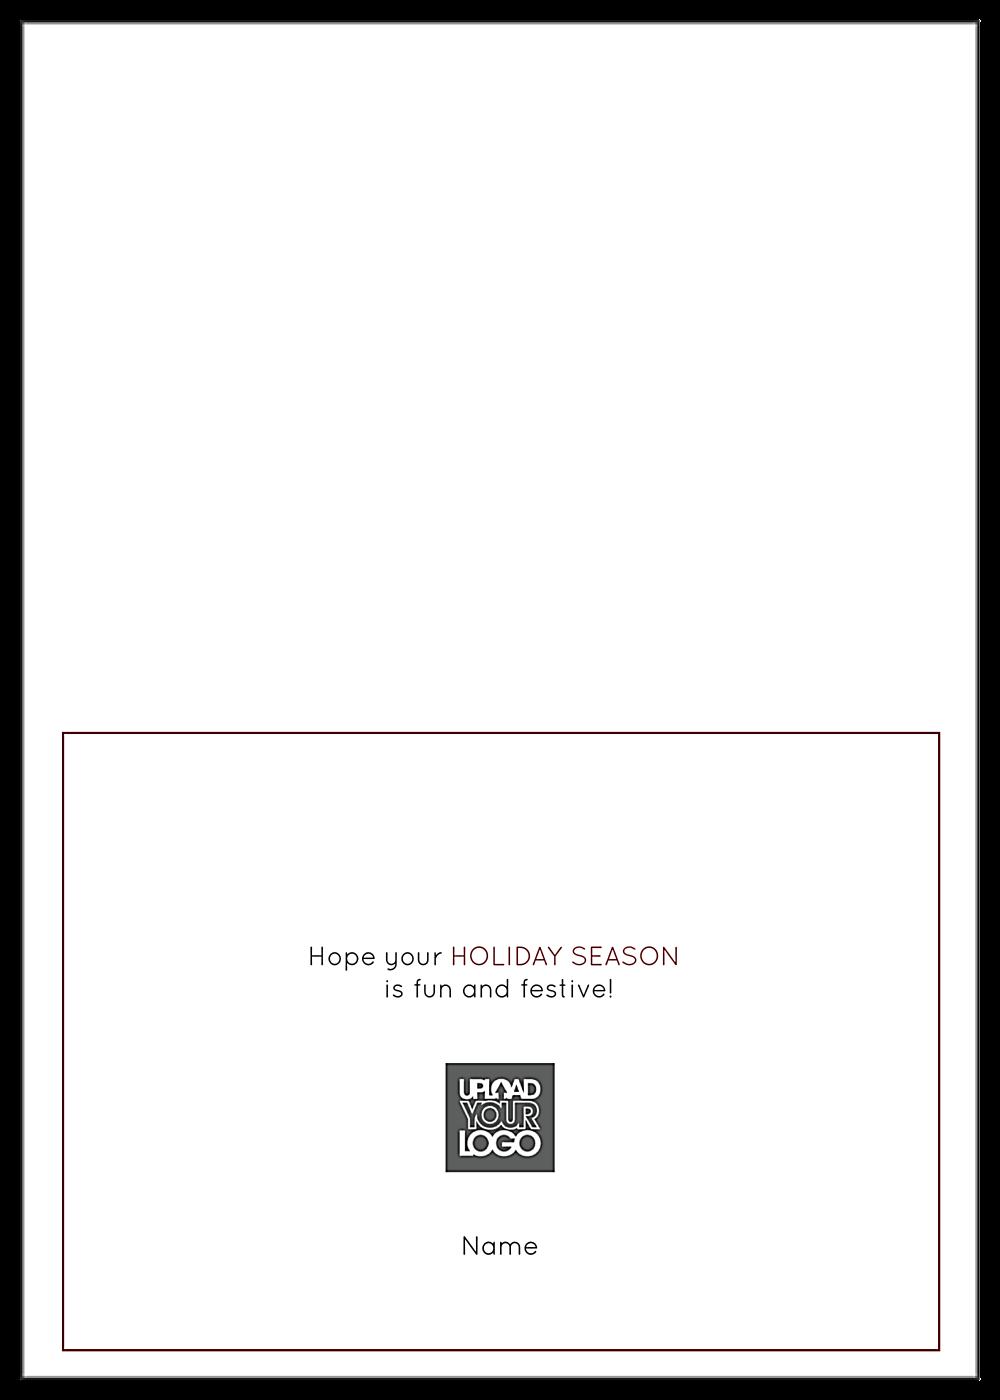 Snowy Reindeer back - Greeting Cards Maker